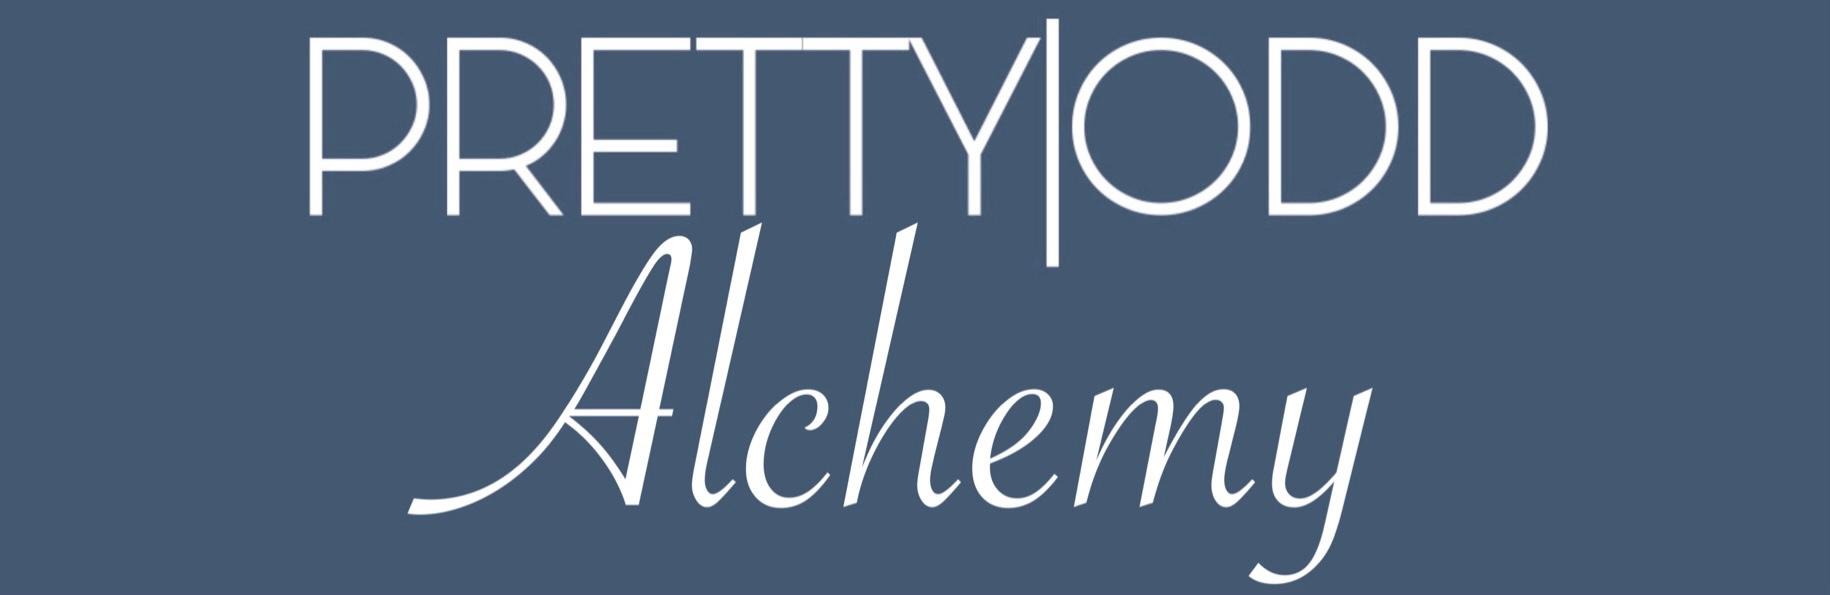 PRETTY | ODD Alchemy